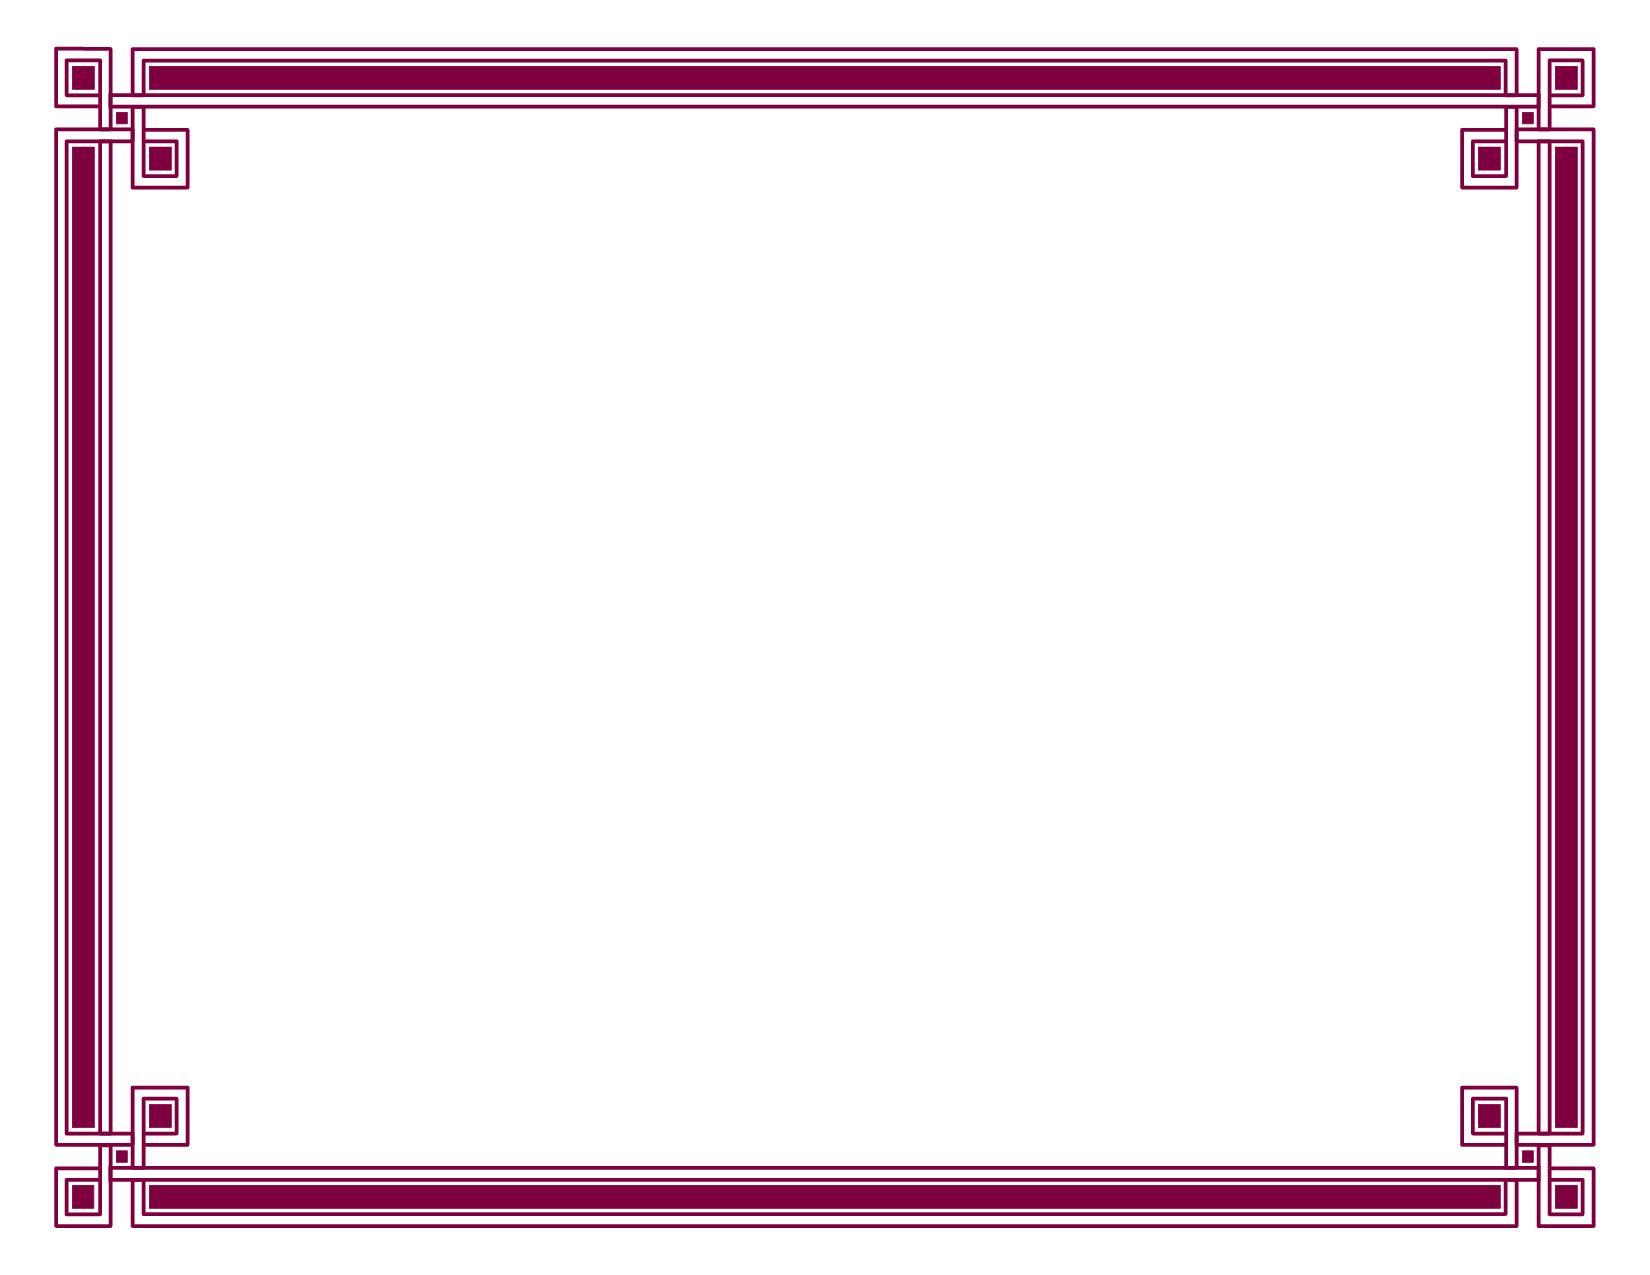 Certificate border clipart free download » Clipart Portal.